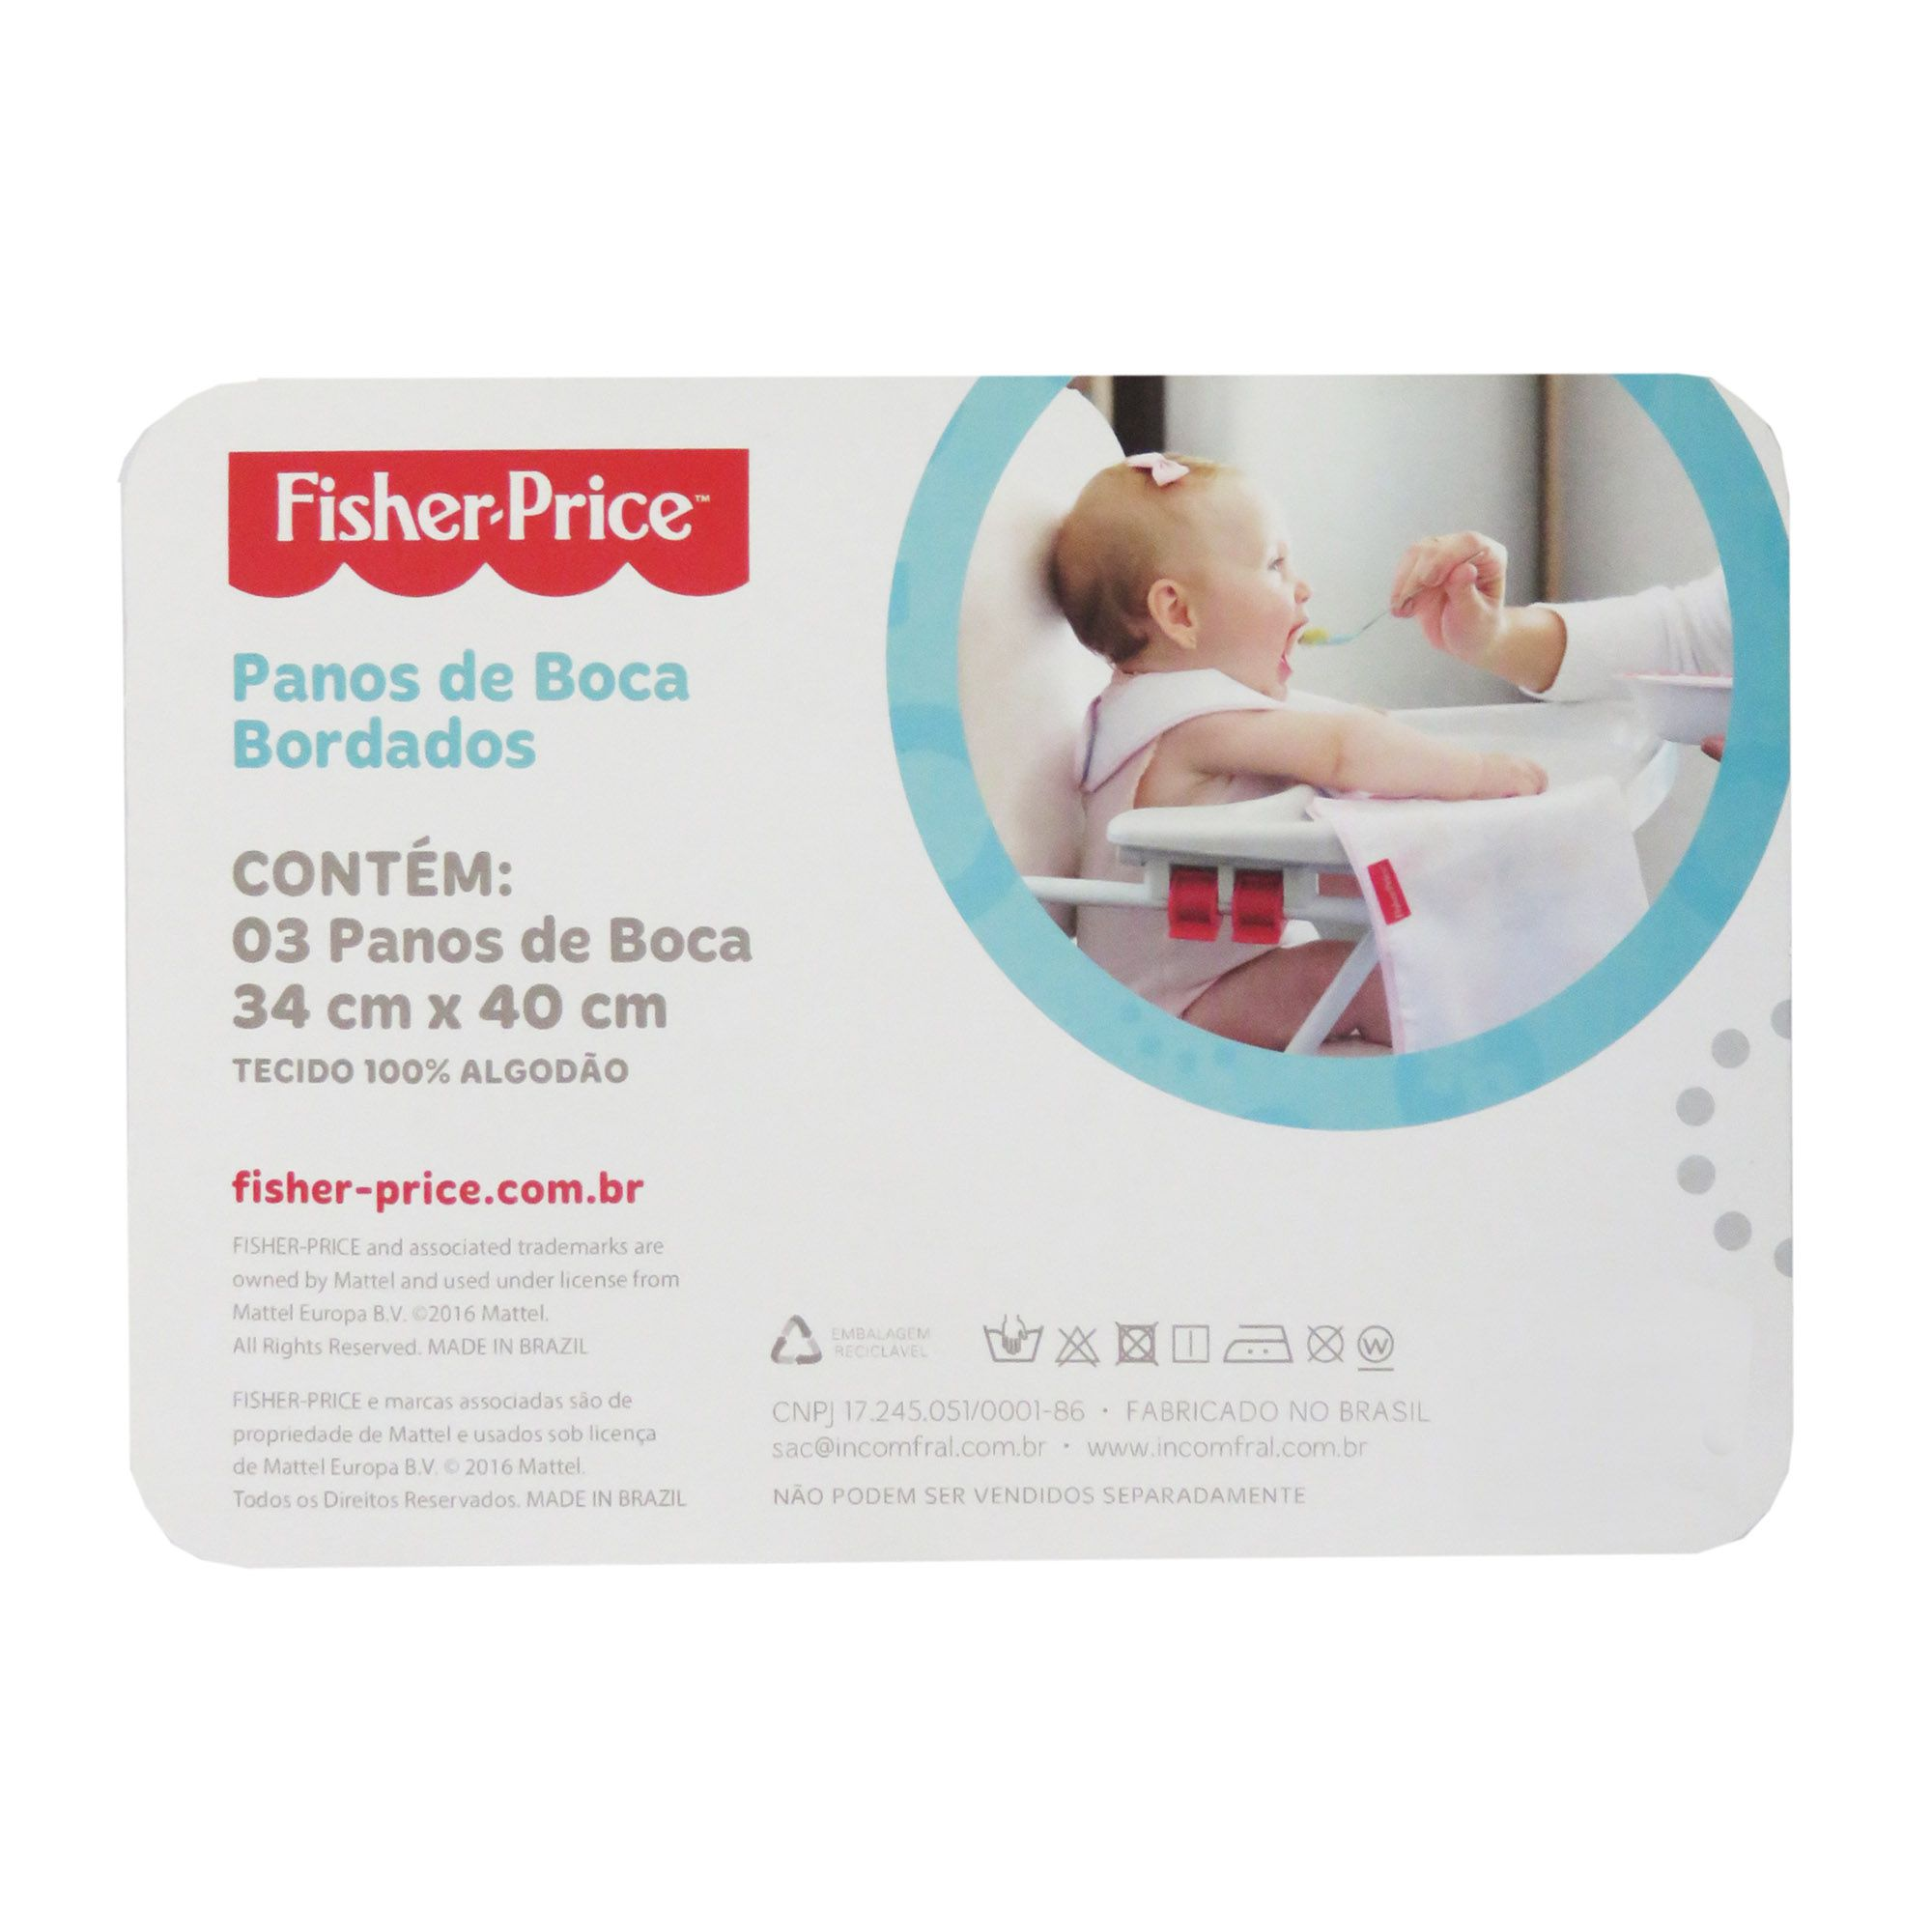 Pano de Boca Incomfral Fisher-Price – Estampado - Amarelo Claro